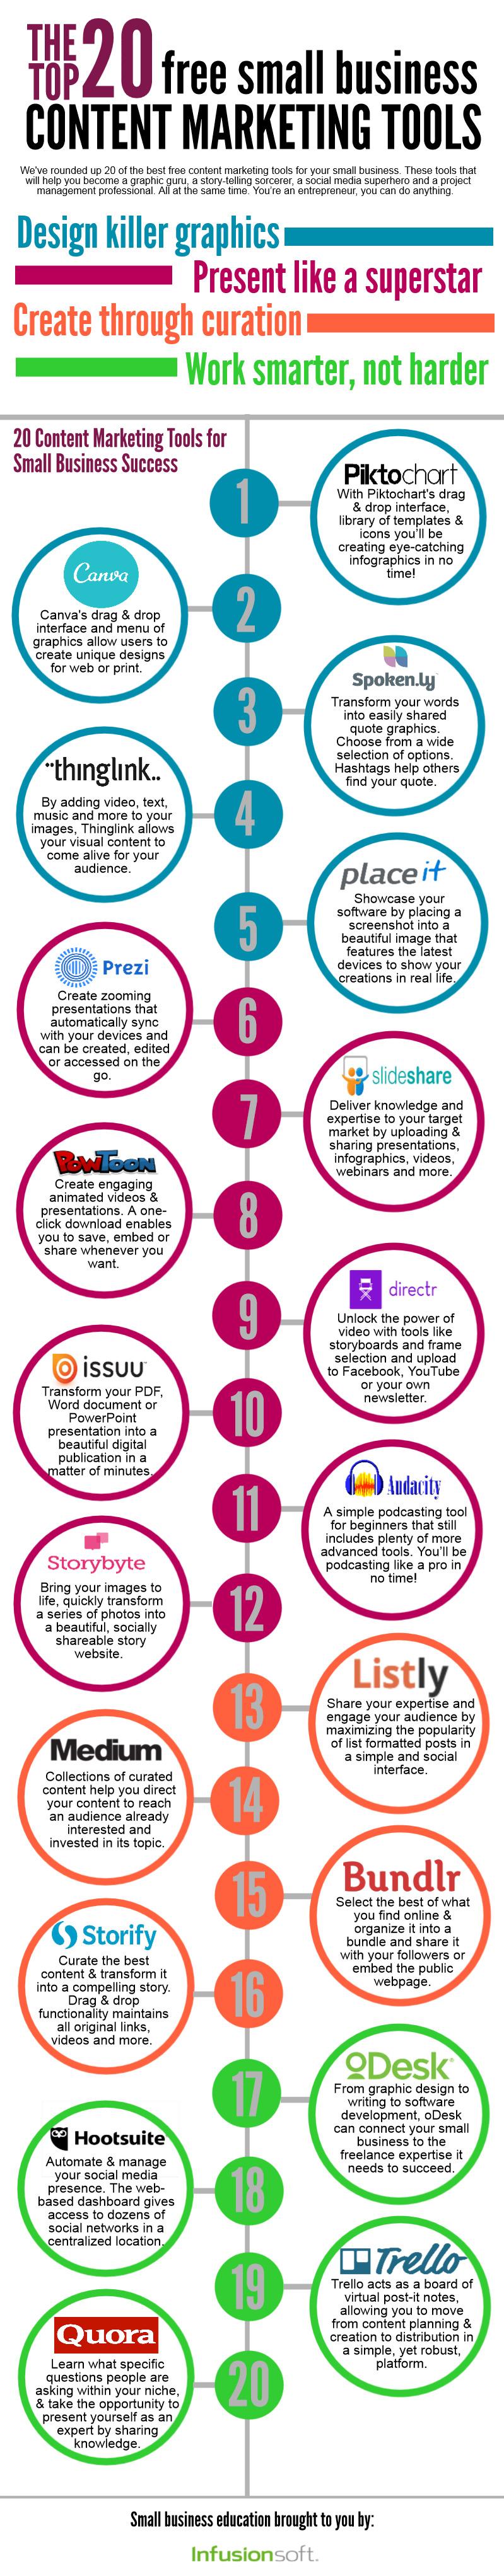 20-Free-Content-Marketing-Tools-Copy-for-edits.jpg